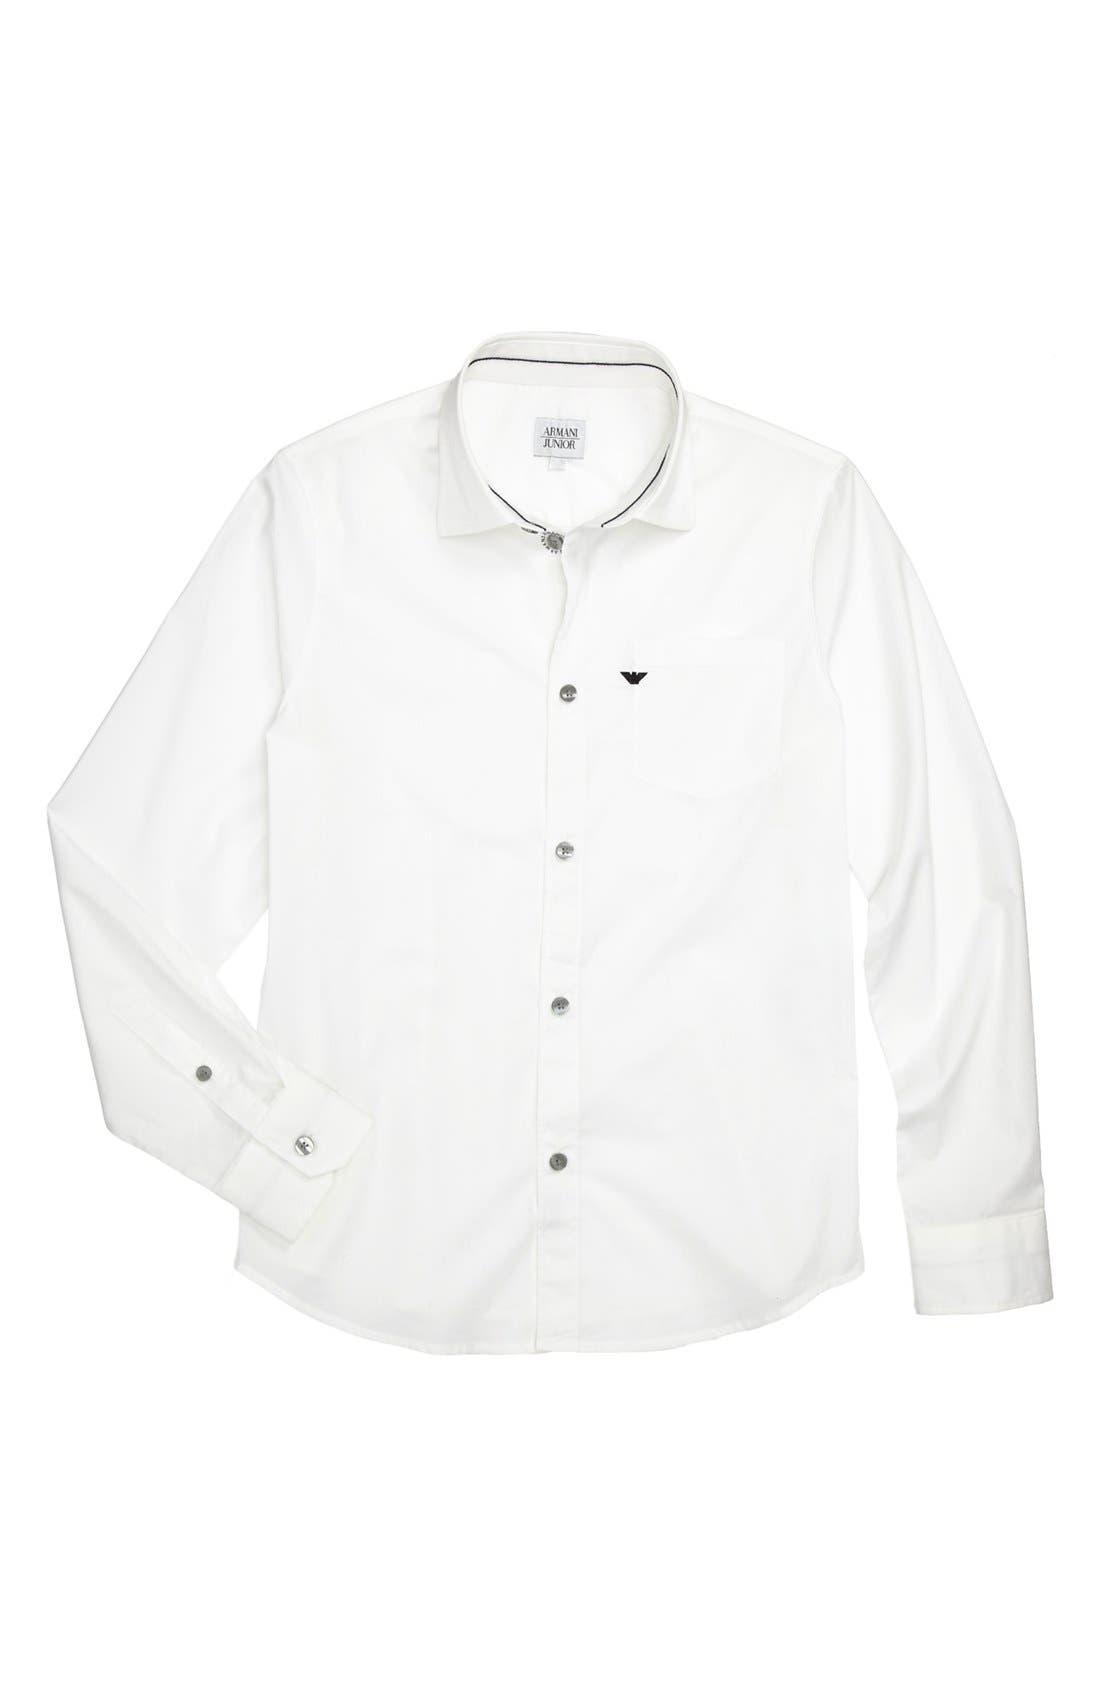 Alternate Image 1 Selected - Armani Junior Sport Shirt (Big Boys)